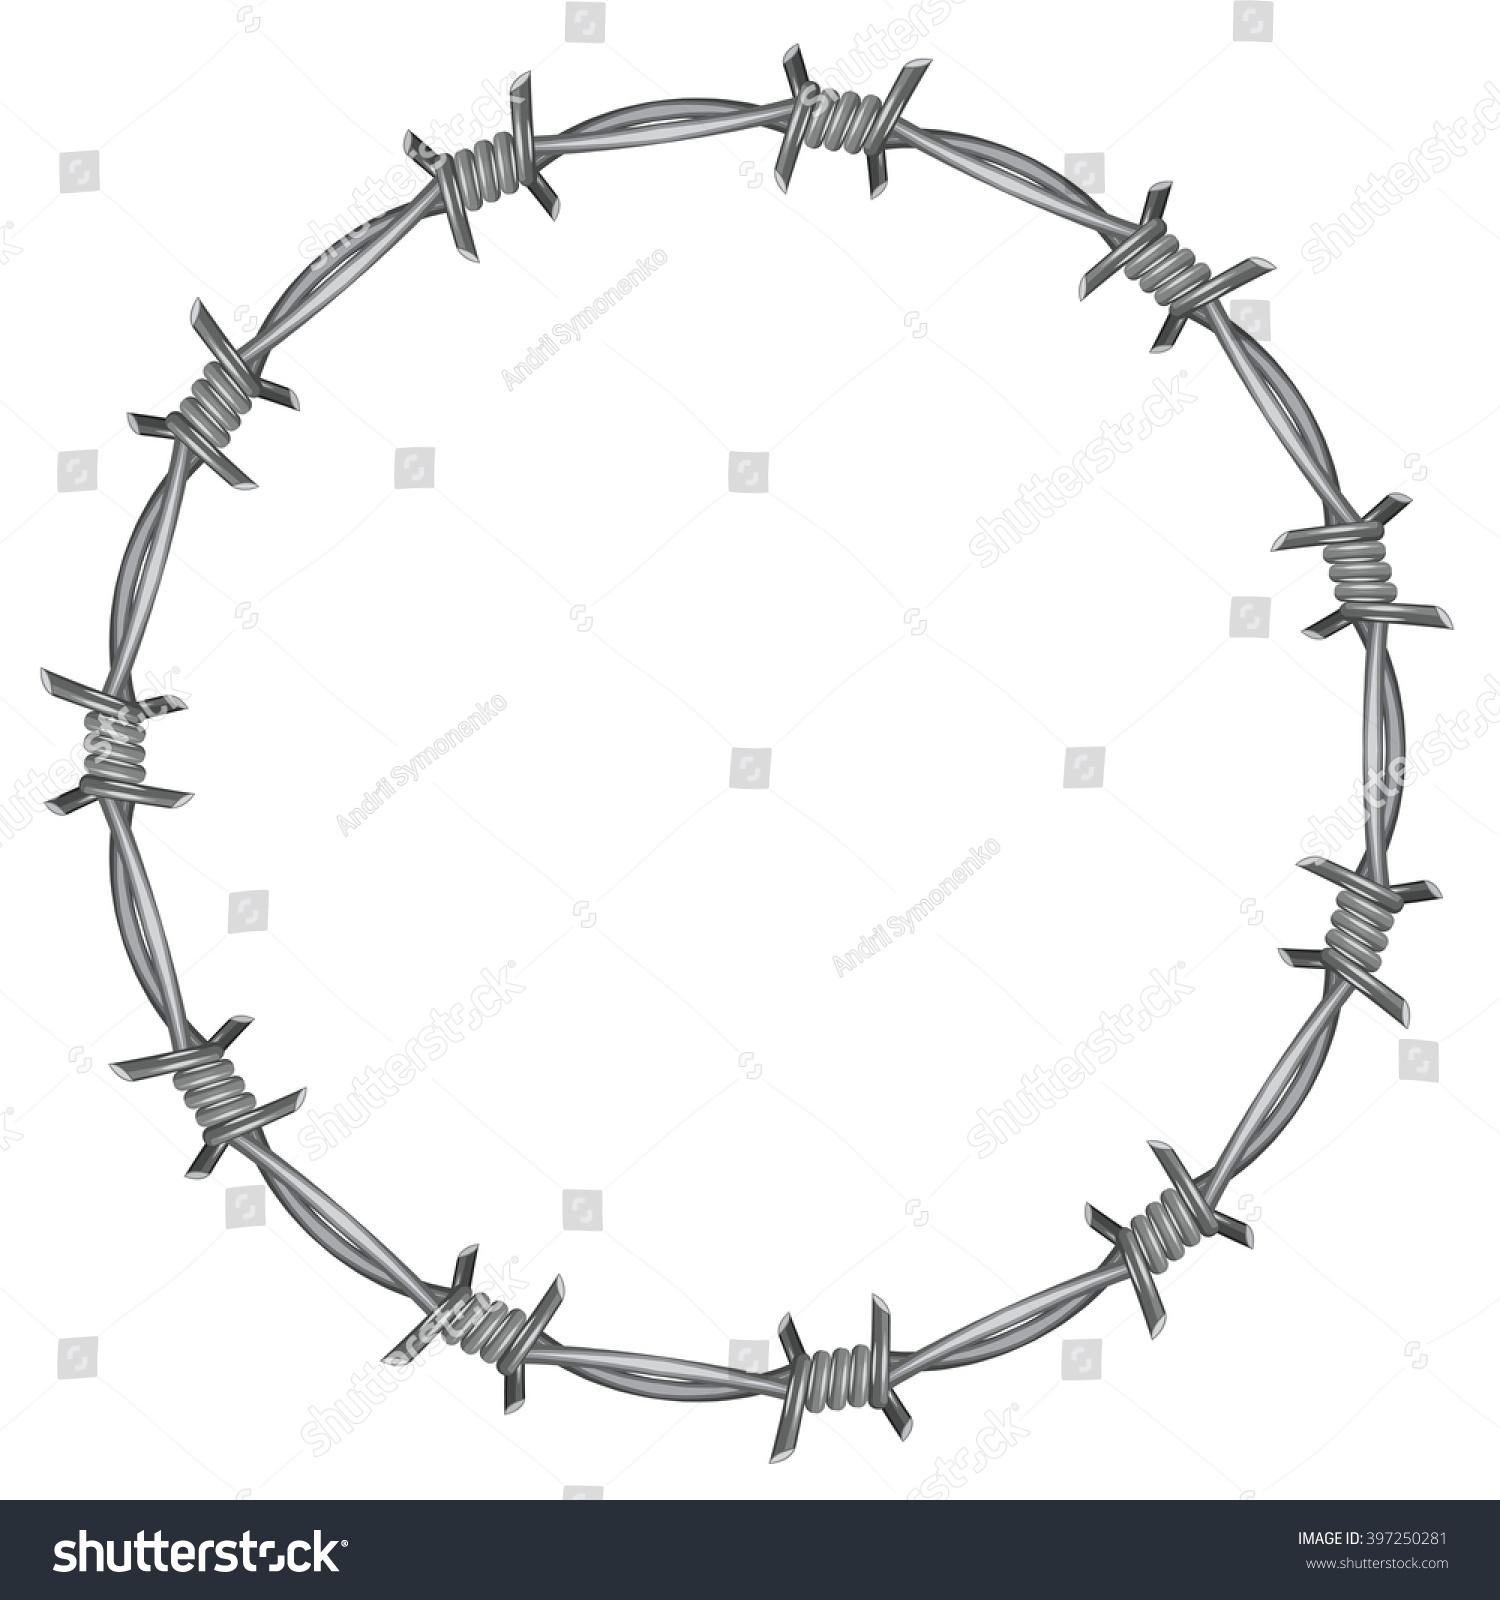 Frame Barbed Wire Stock Illustration 397250281 - Shutterstock